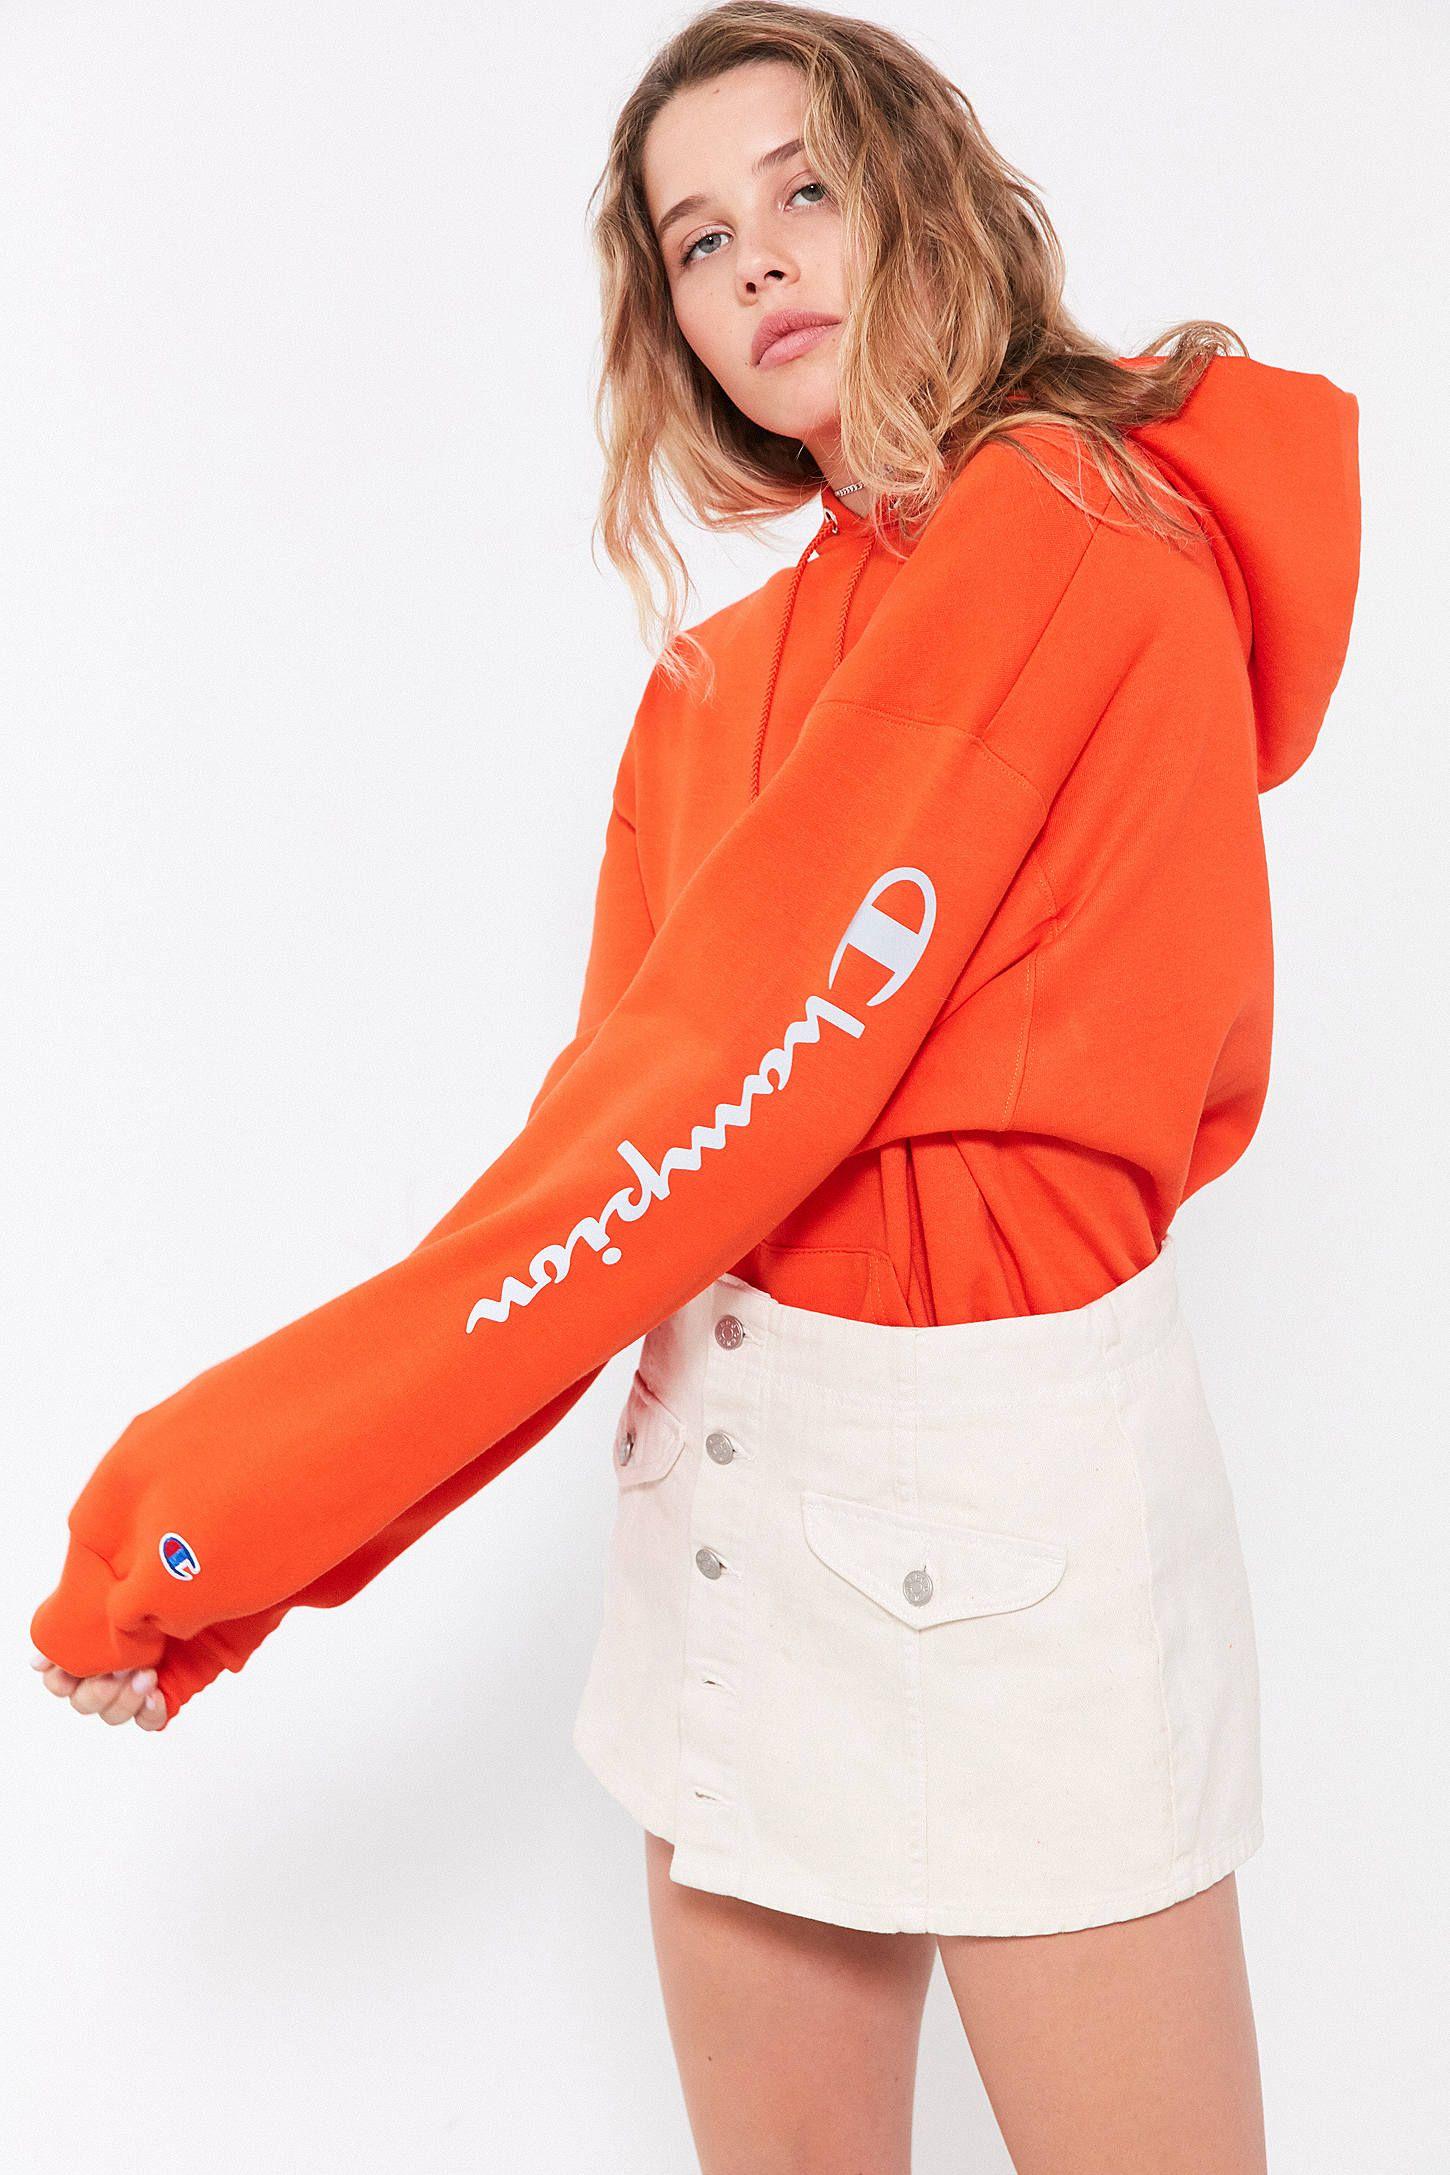 5058bb419cb Slide View  5  Champion + UO Powerblend Reflective Hoodie Sweatshirt ...